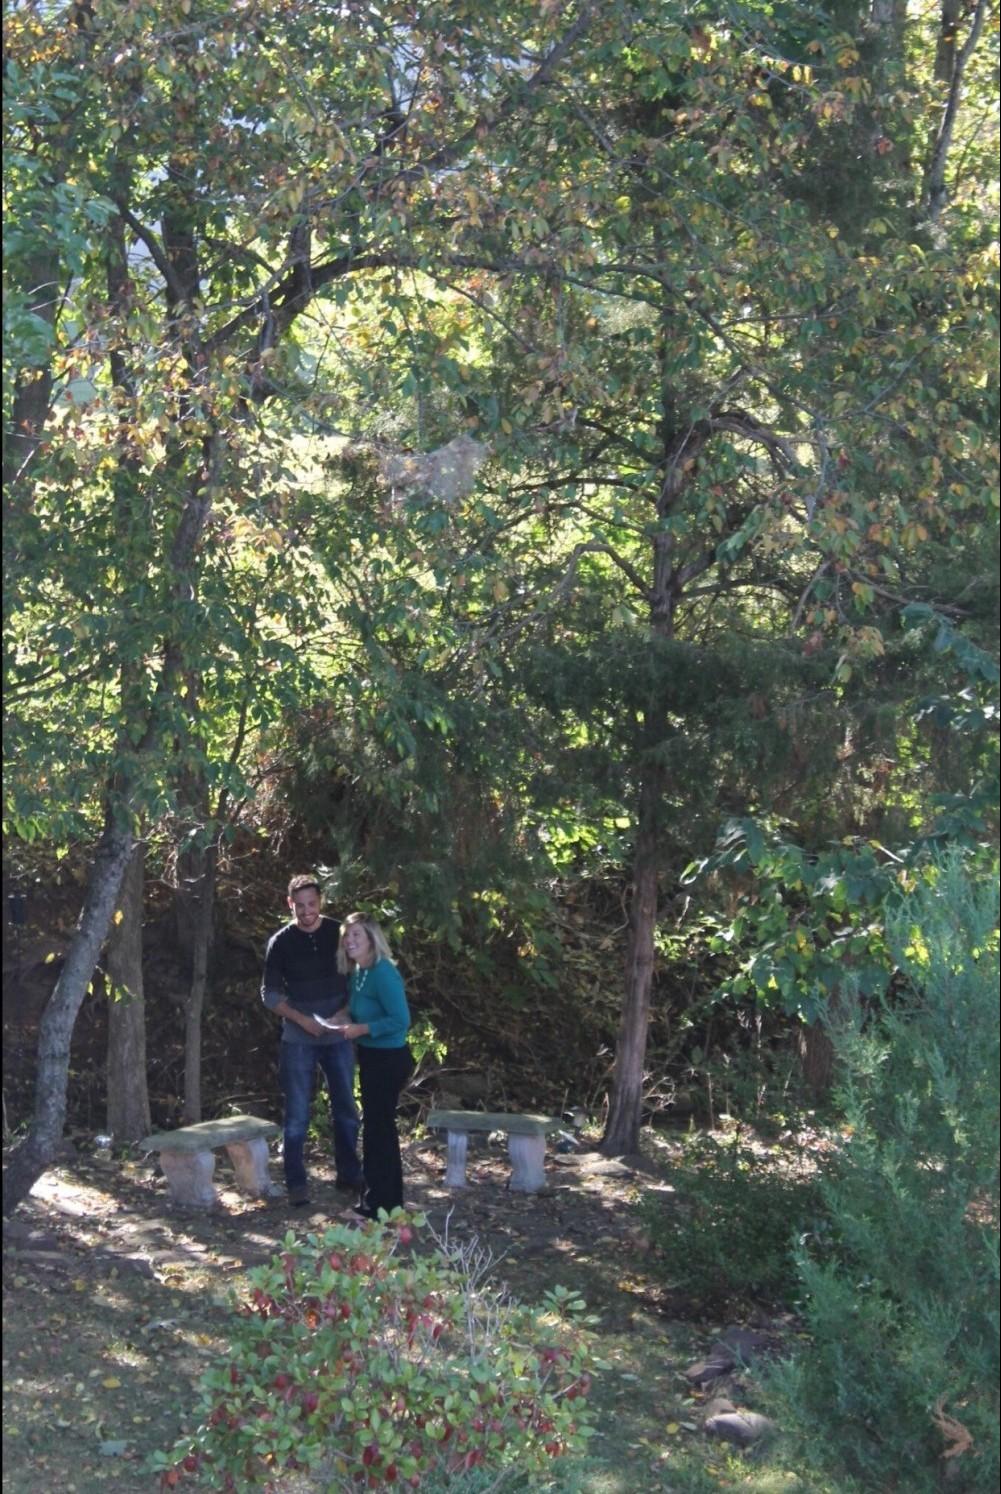 Image 4 of Kristin and Shaun